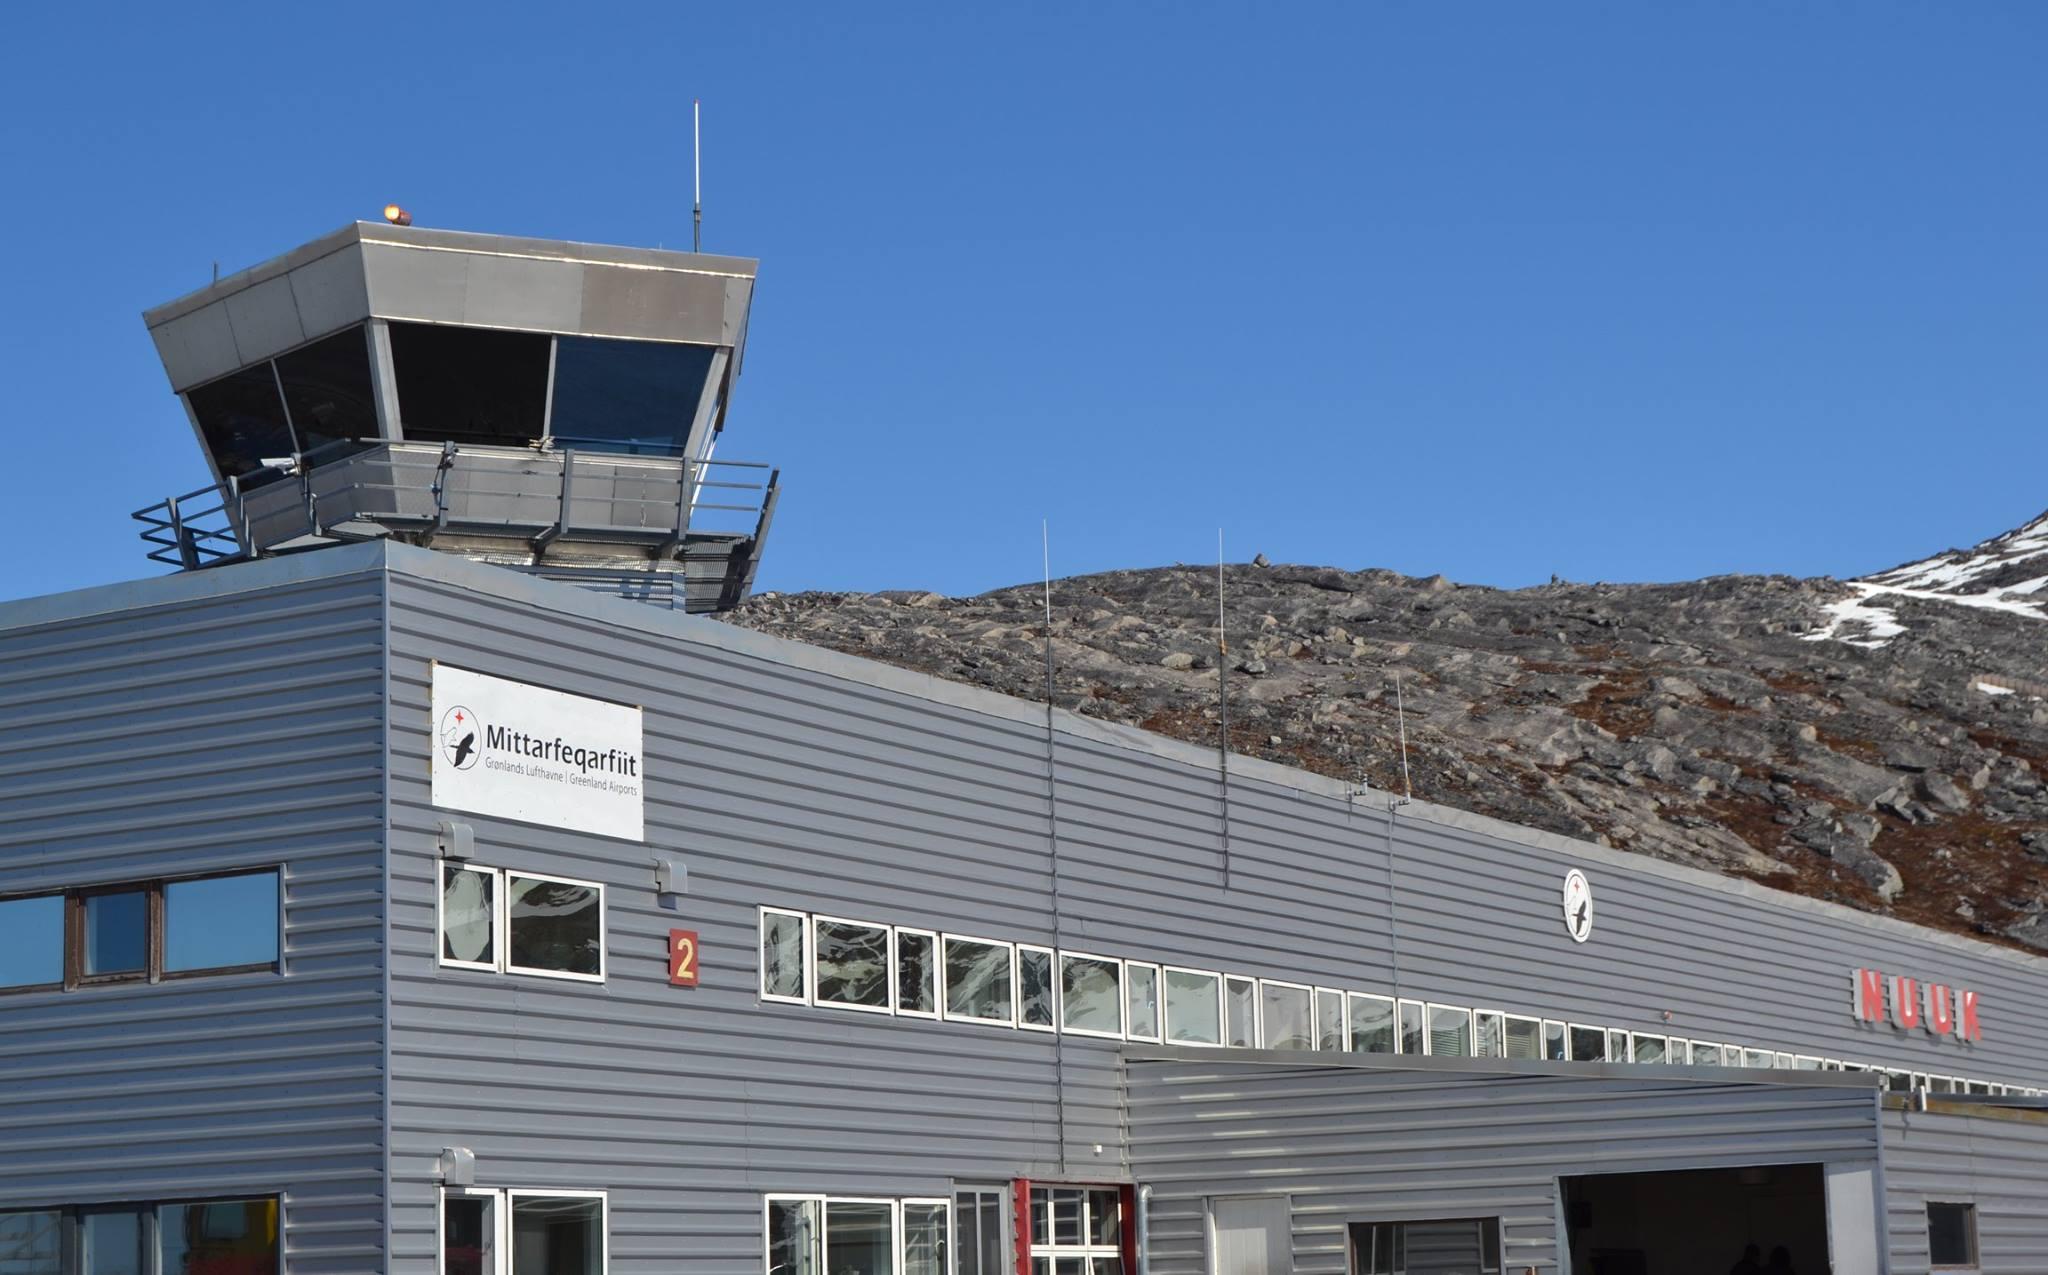 Mittarfeqarfiit – Grønlands Lufthavne – hovedkontoret i Nuuk. (Foto: Mittarfeqarfiit)